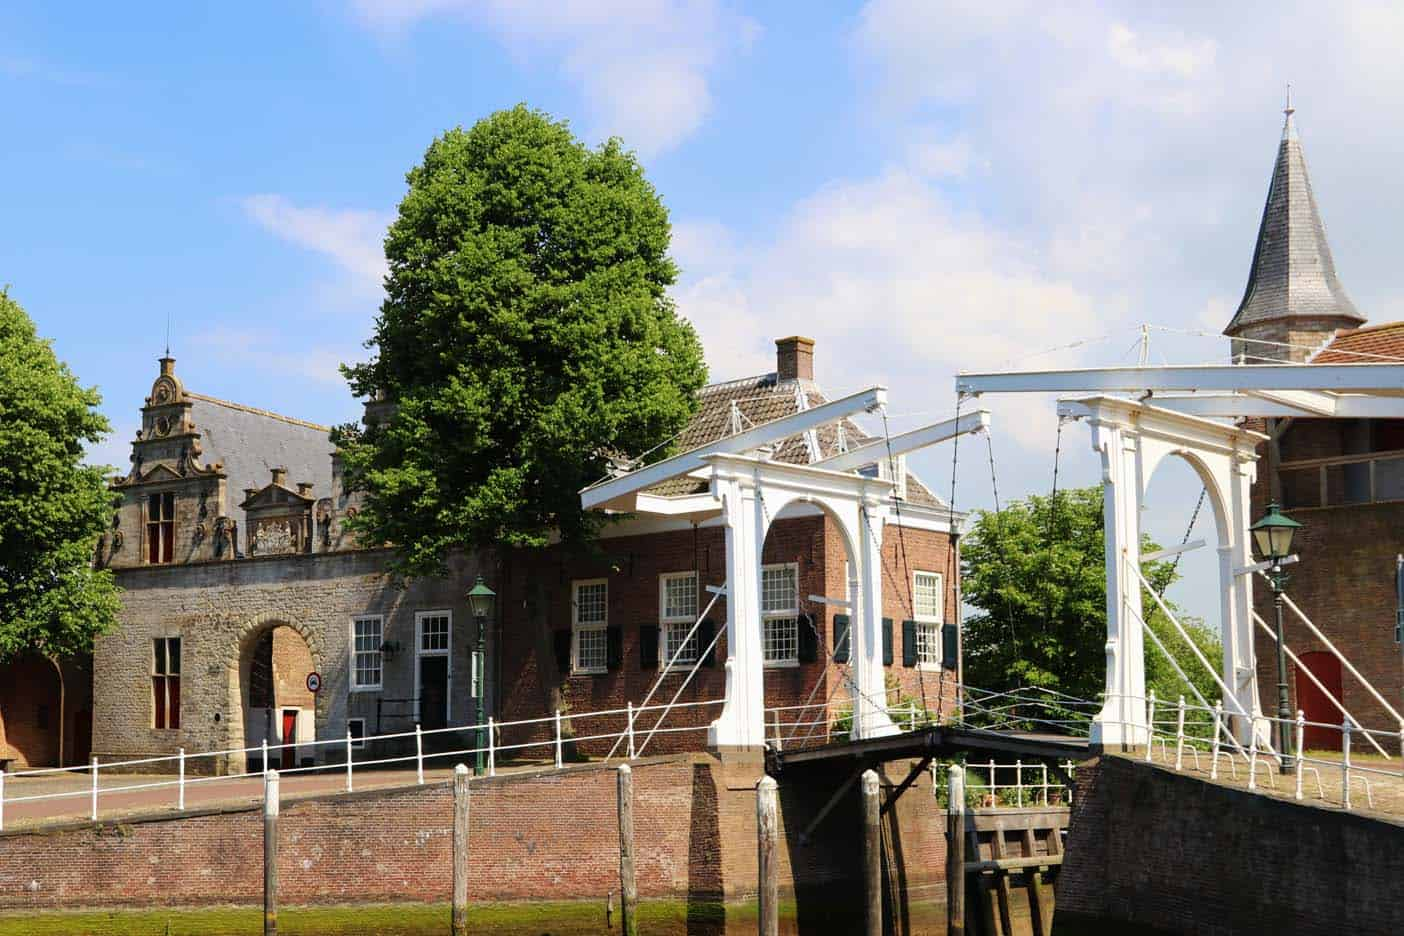 park Landal Resort Haamstede zierikzee